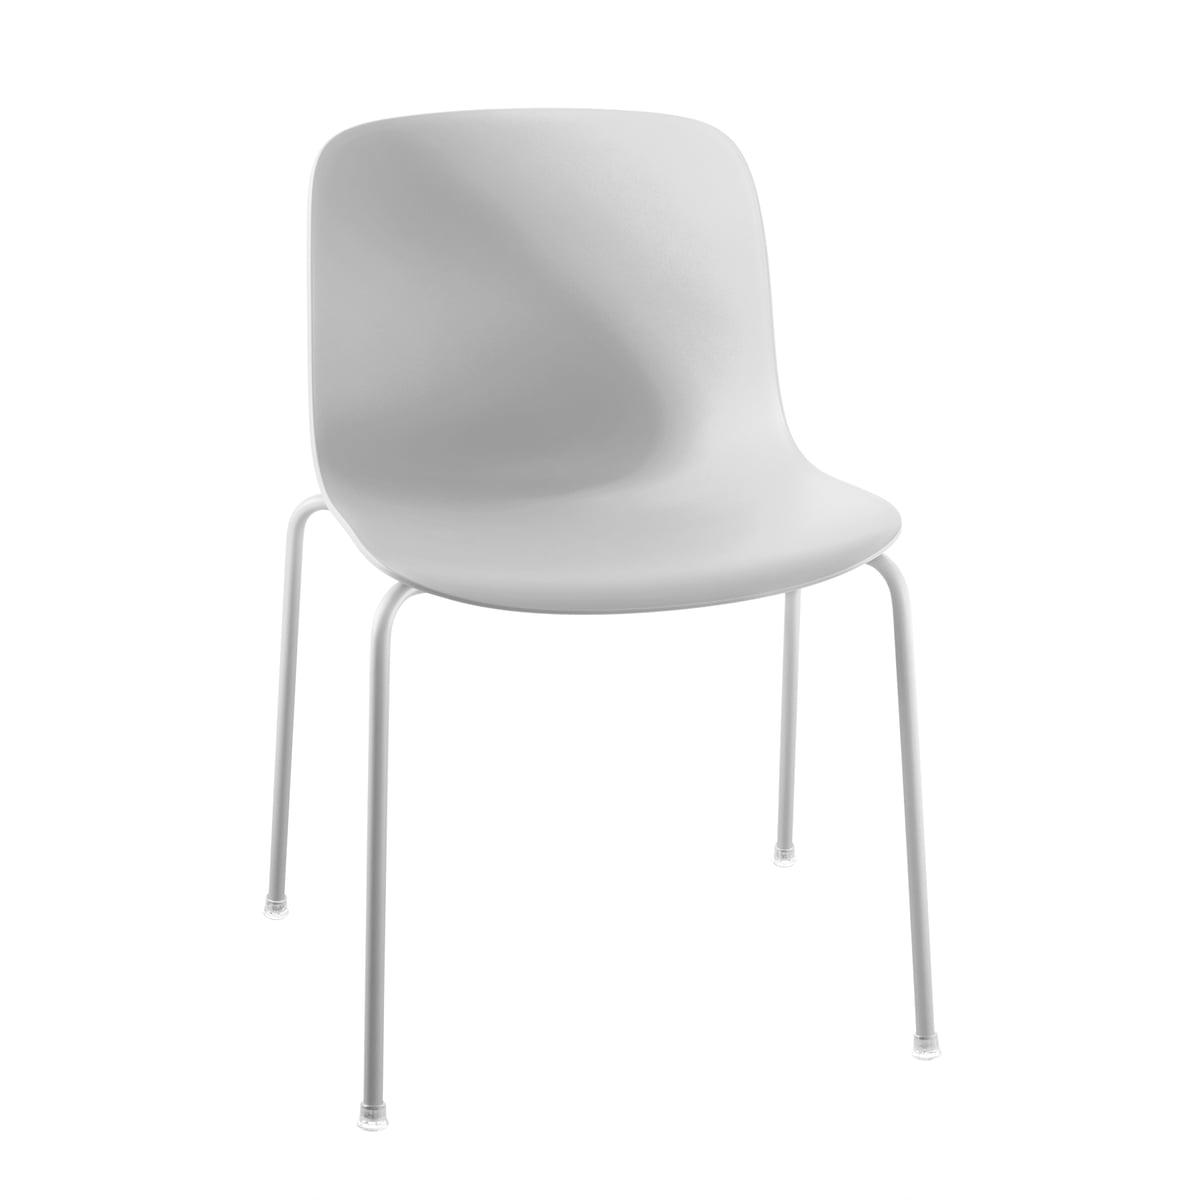 Magis PolypropylenWeiß1735 Troy Stuhl C Magis PolypropylenWeiß1735 Stuhl Stuhl Troy Magis PolypropylenWeiß1735 C Troy XwP08kNnO